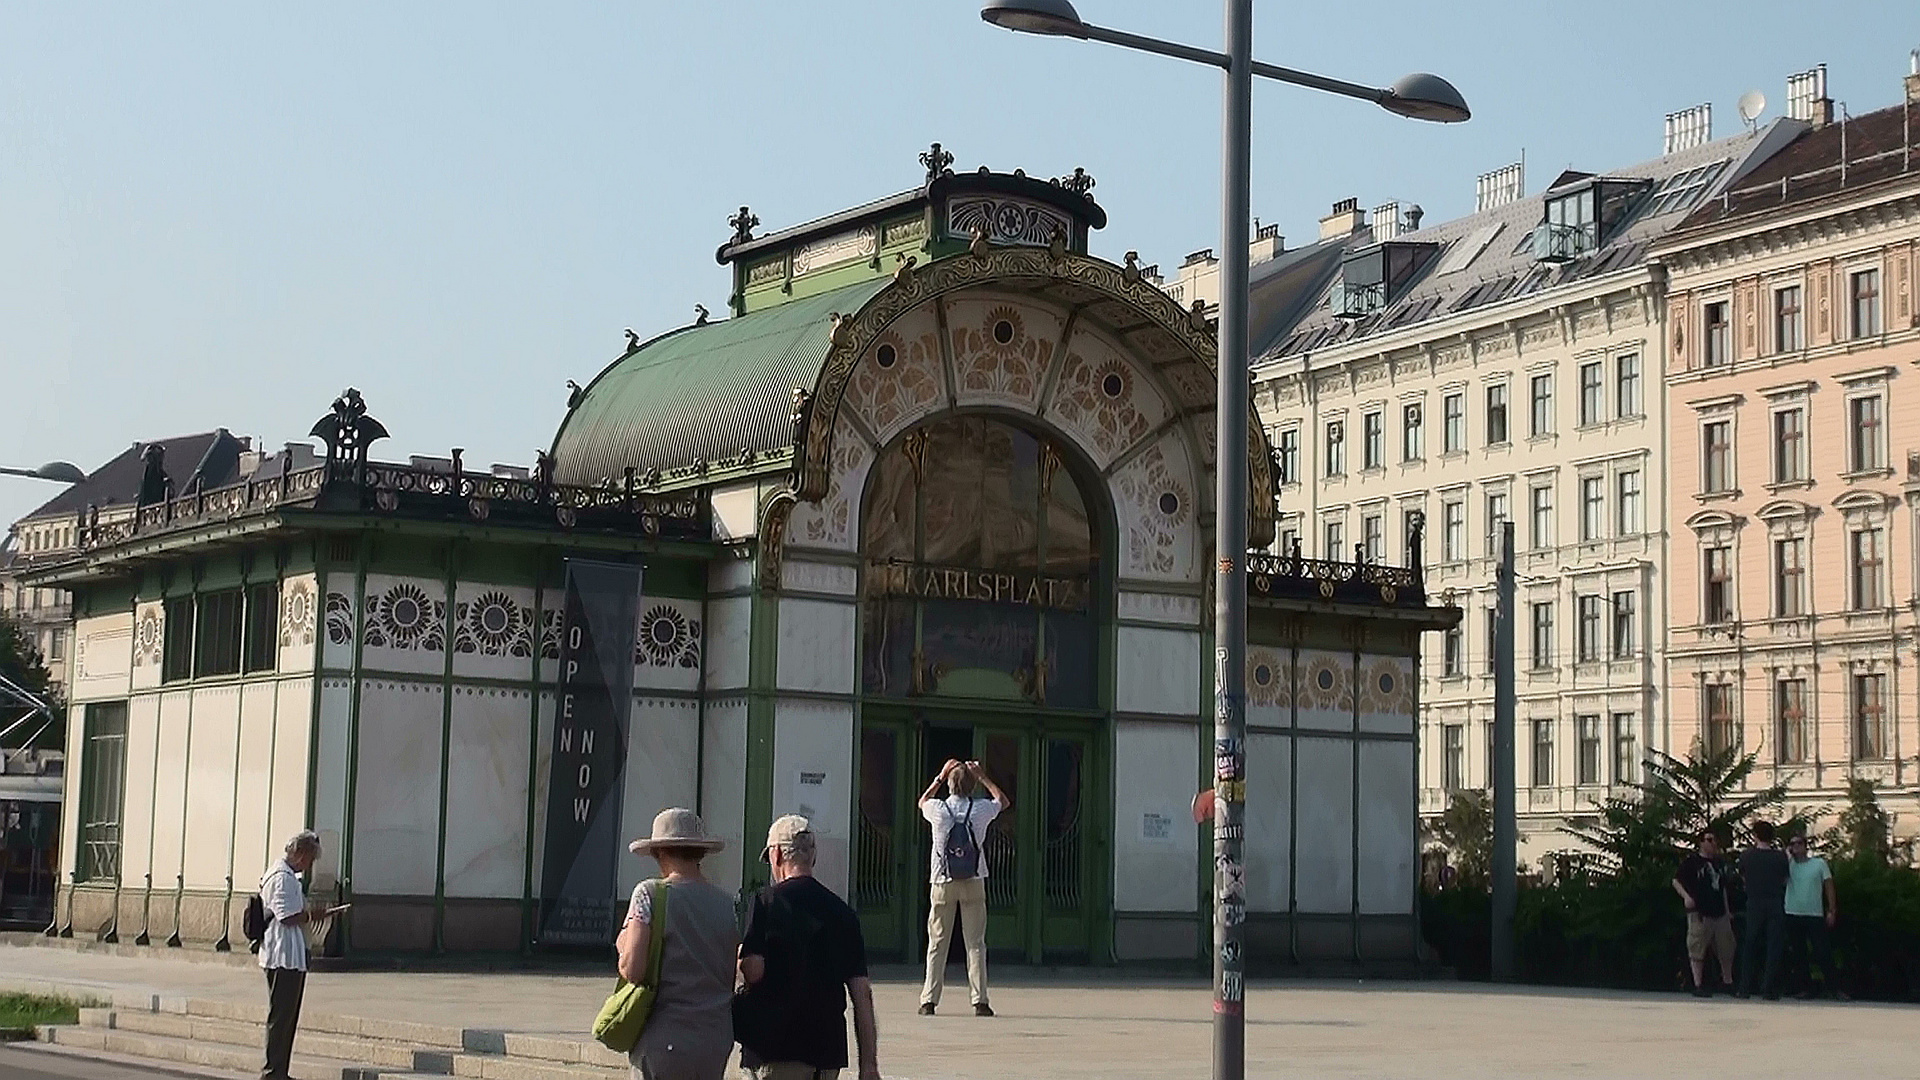 U-Bahnstation Karlsplatz